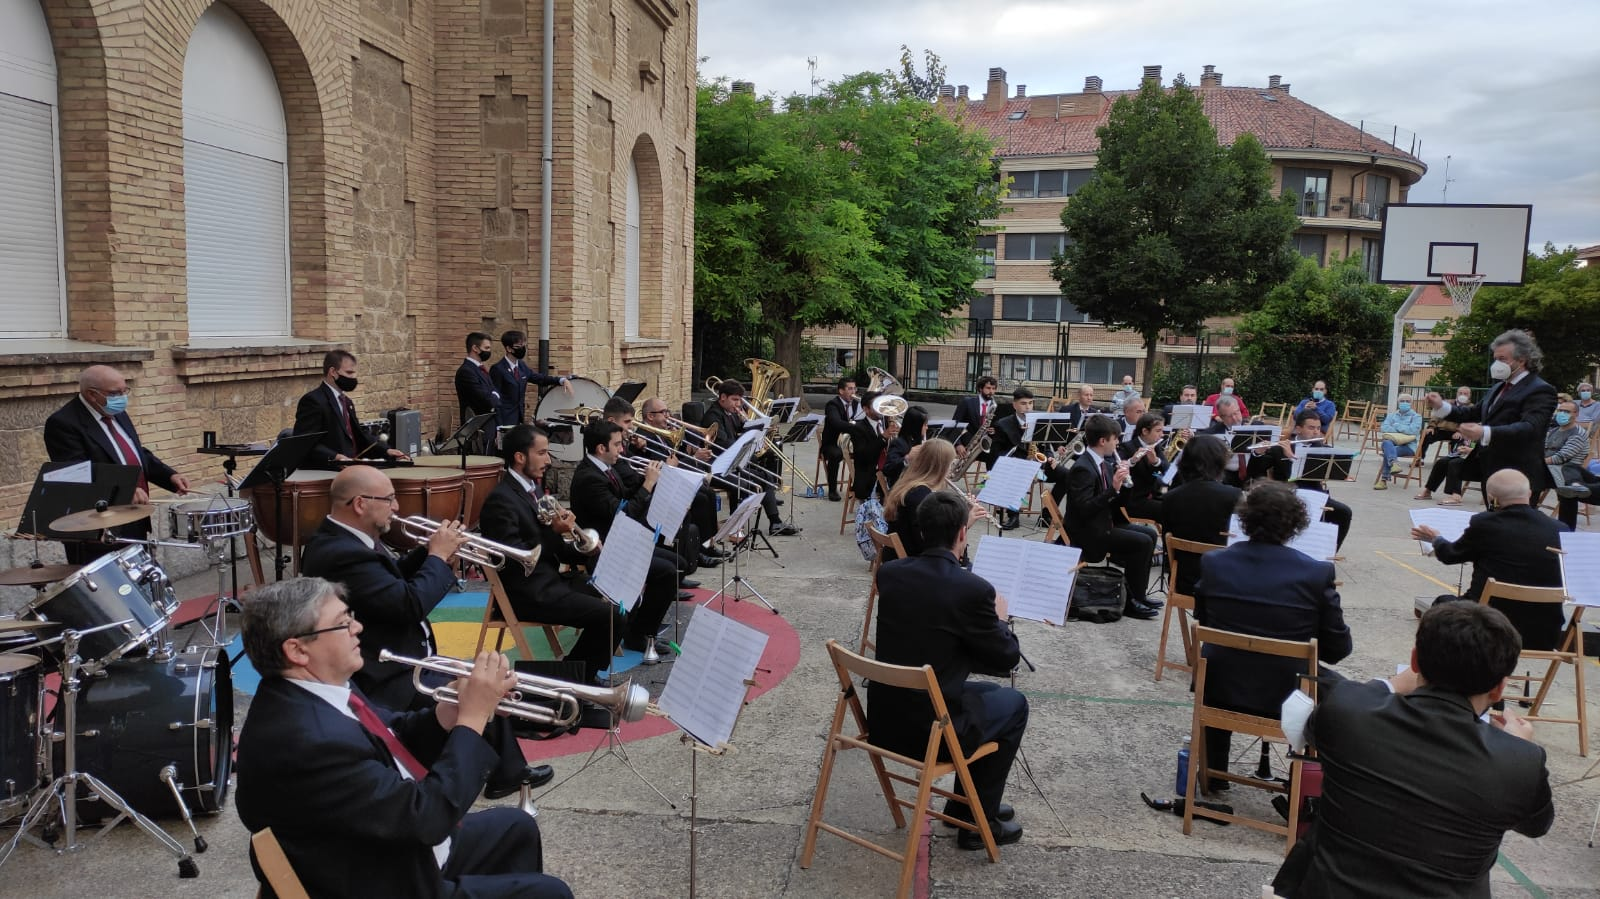 Banda de Municipal de Música de Haro